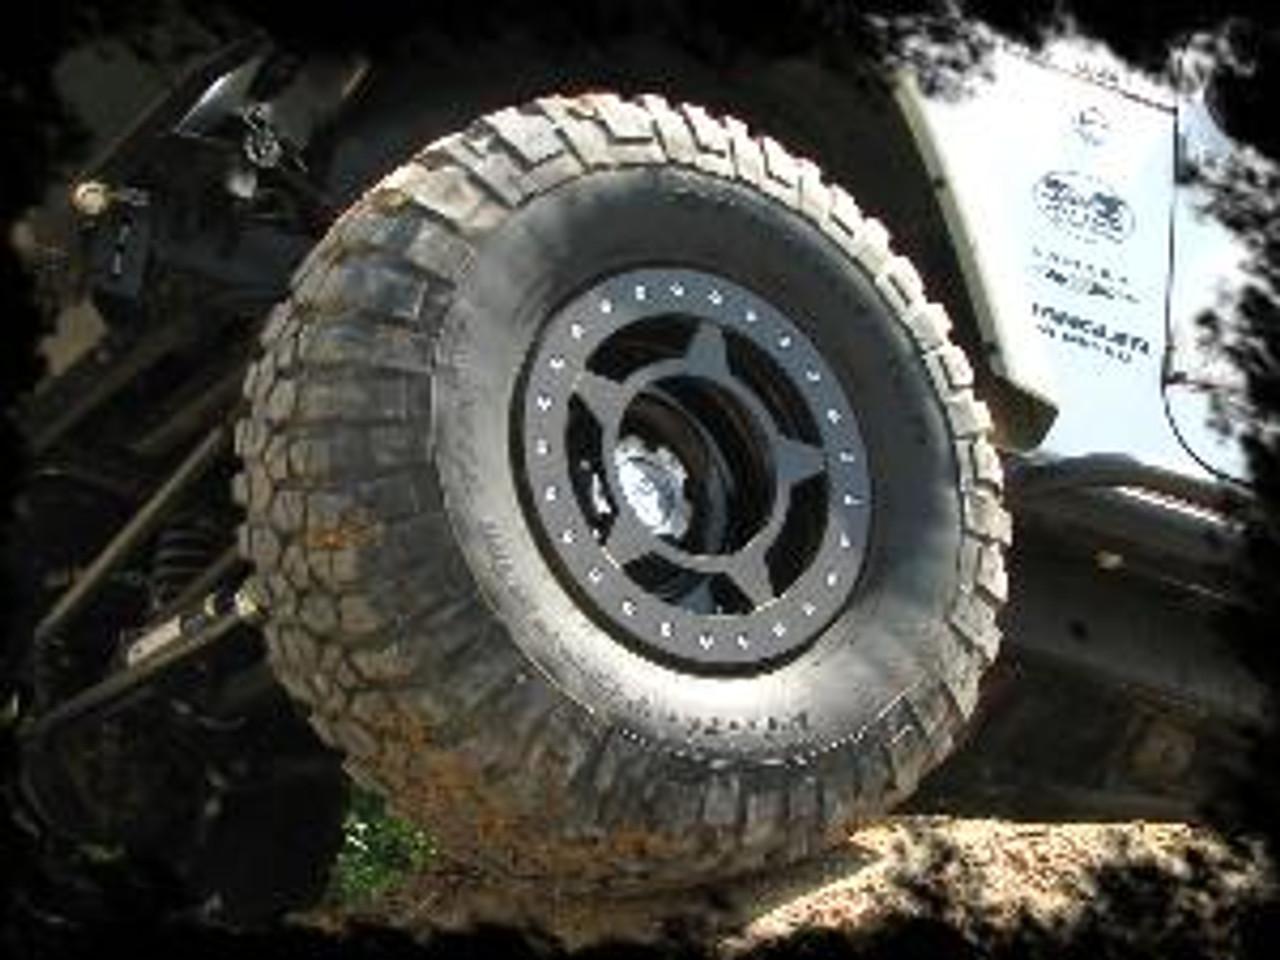 "Spyderlock 17x9.5""  Wheel Mounted on Jeep Wrangler"